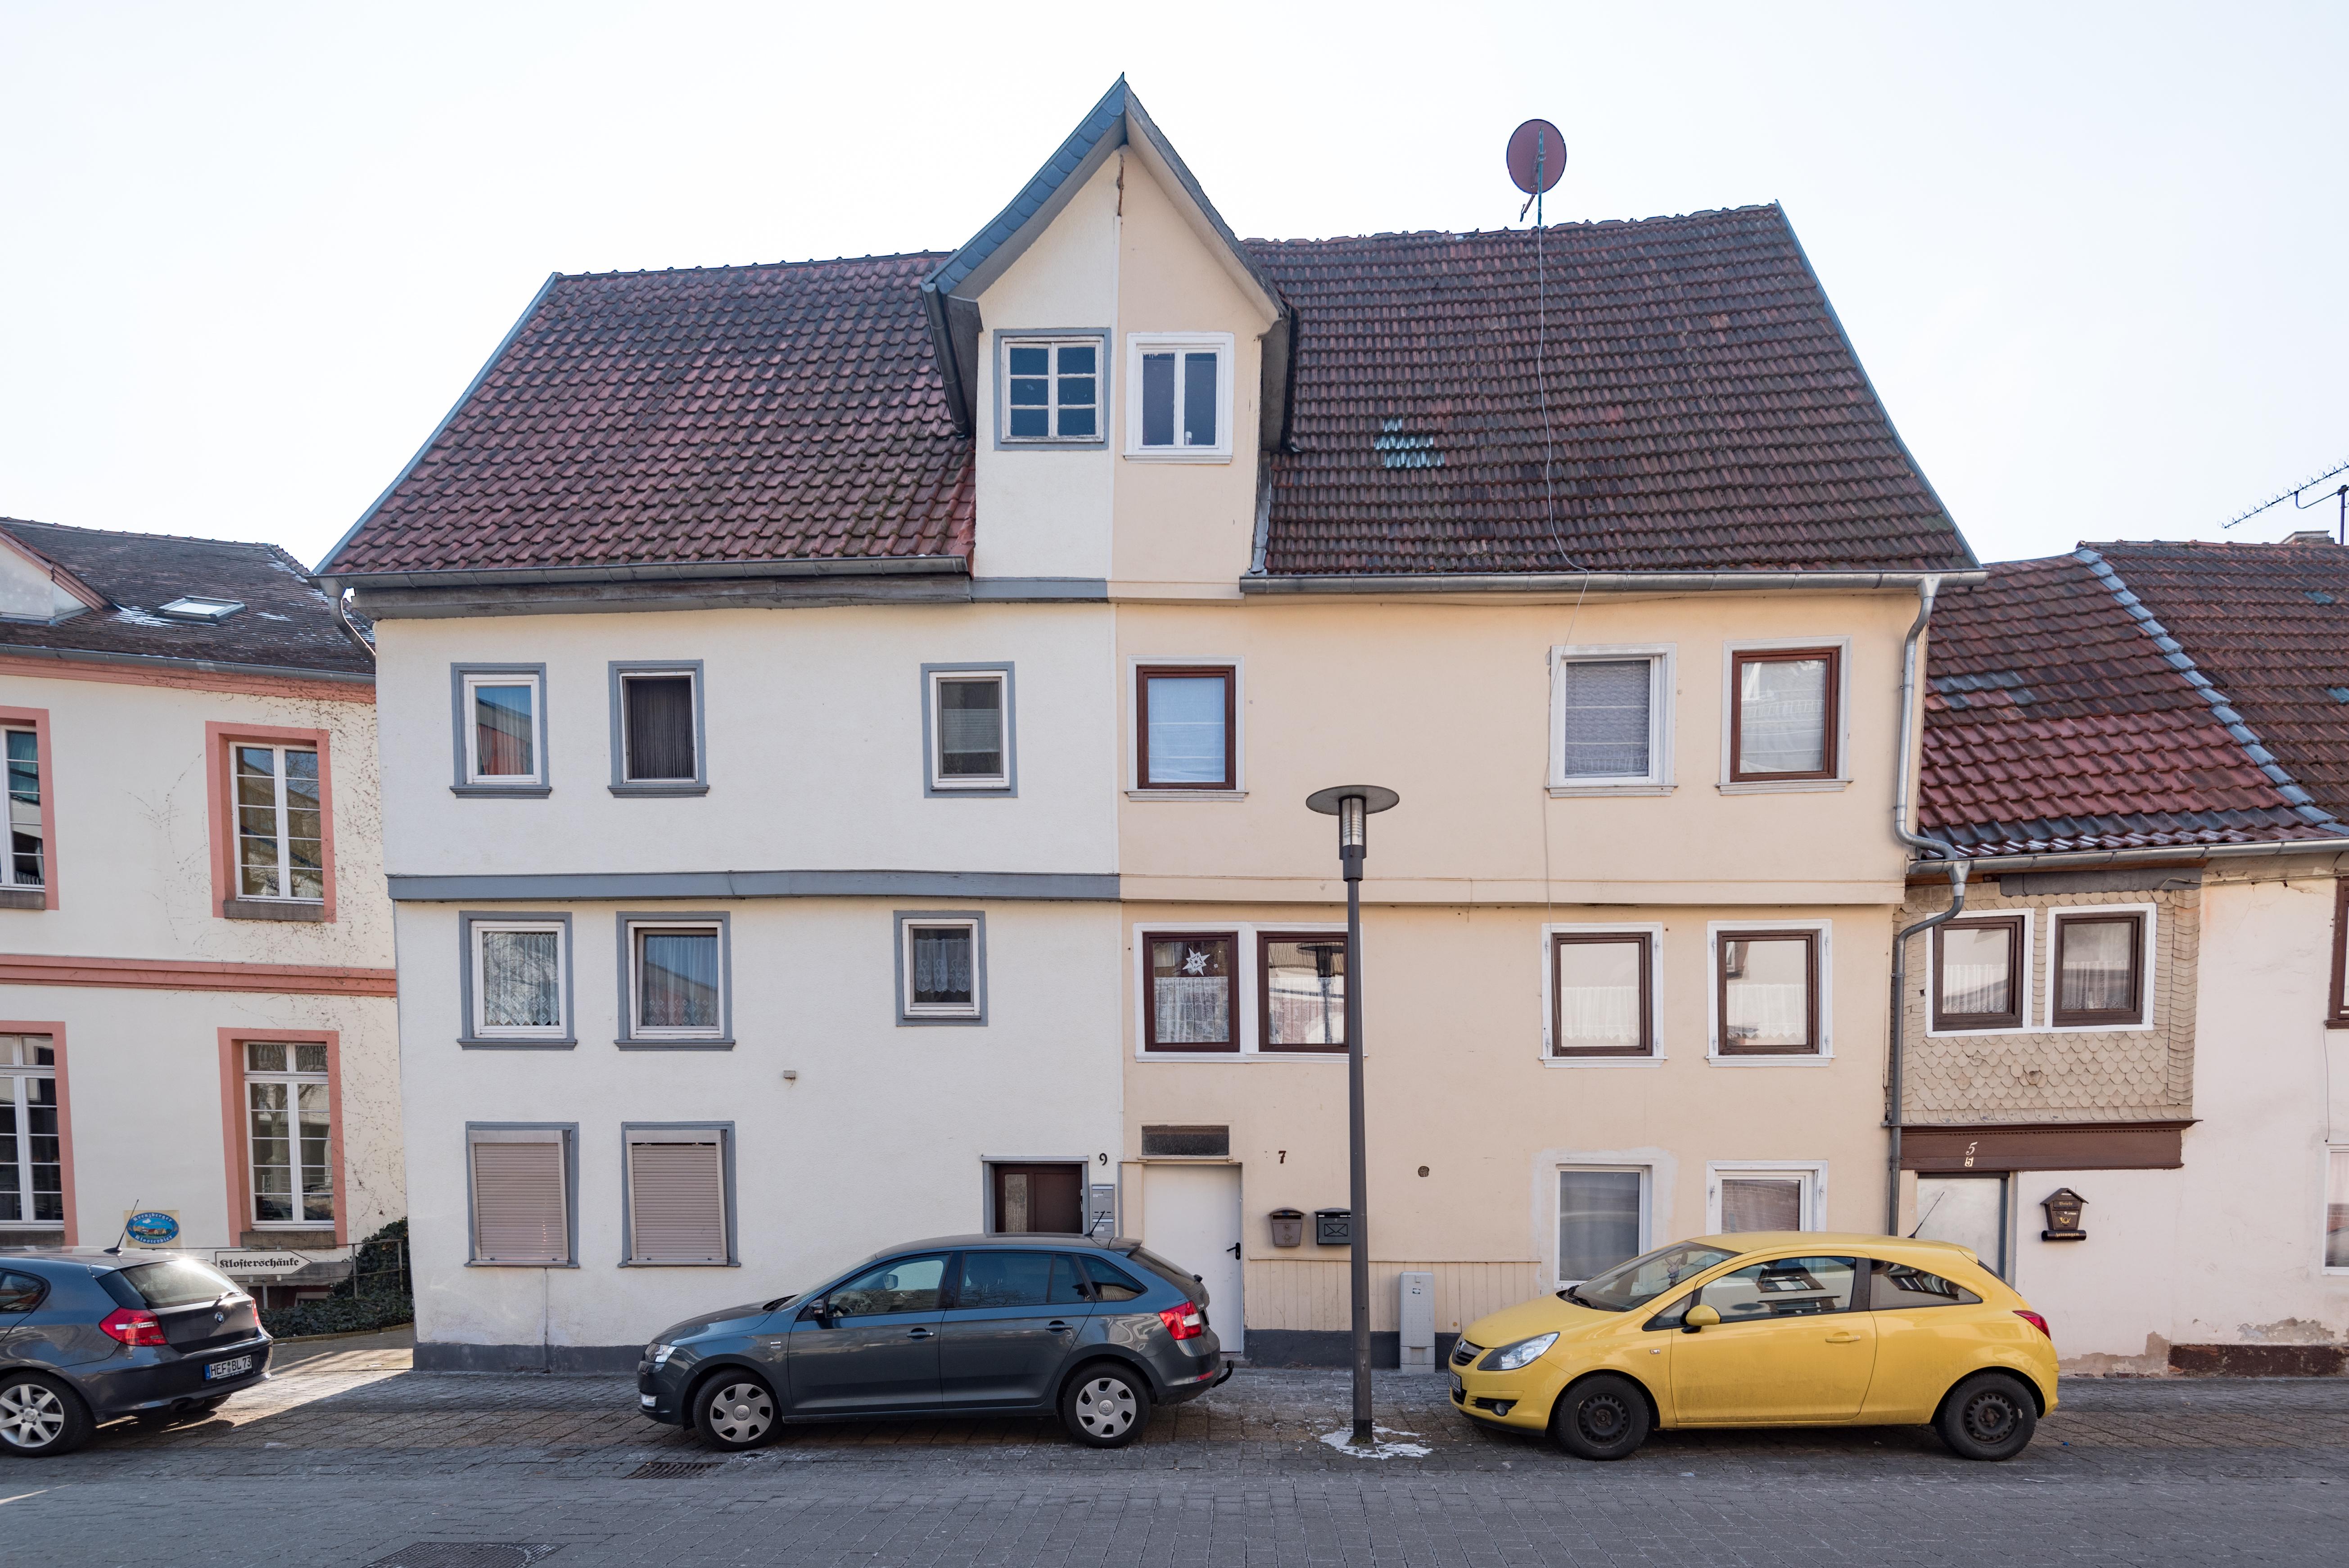 Datei:Neumarkt 7, 9 Bad Hersfeld 20180302 002.jpg – Wikipedia